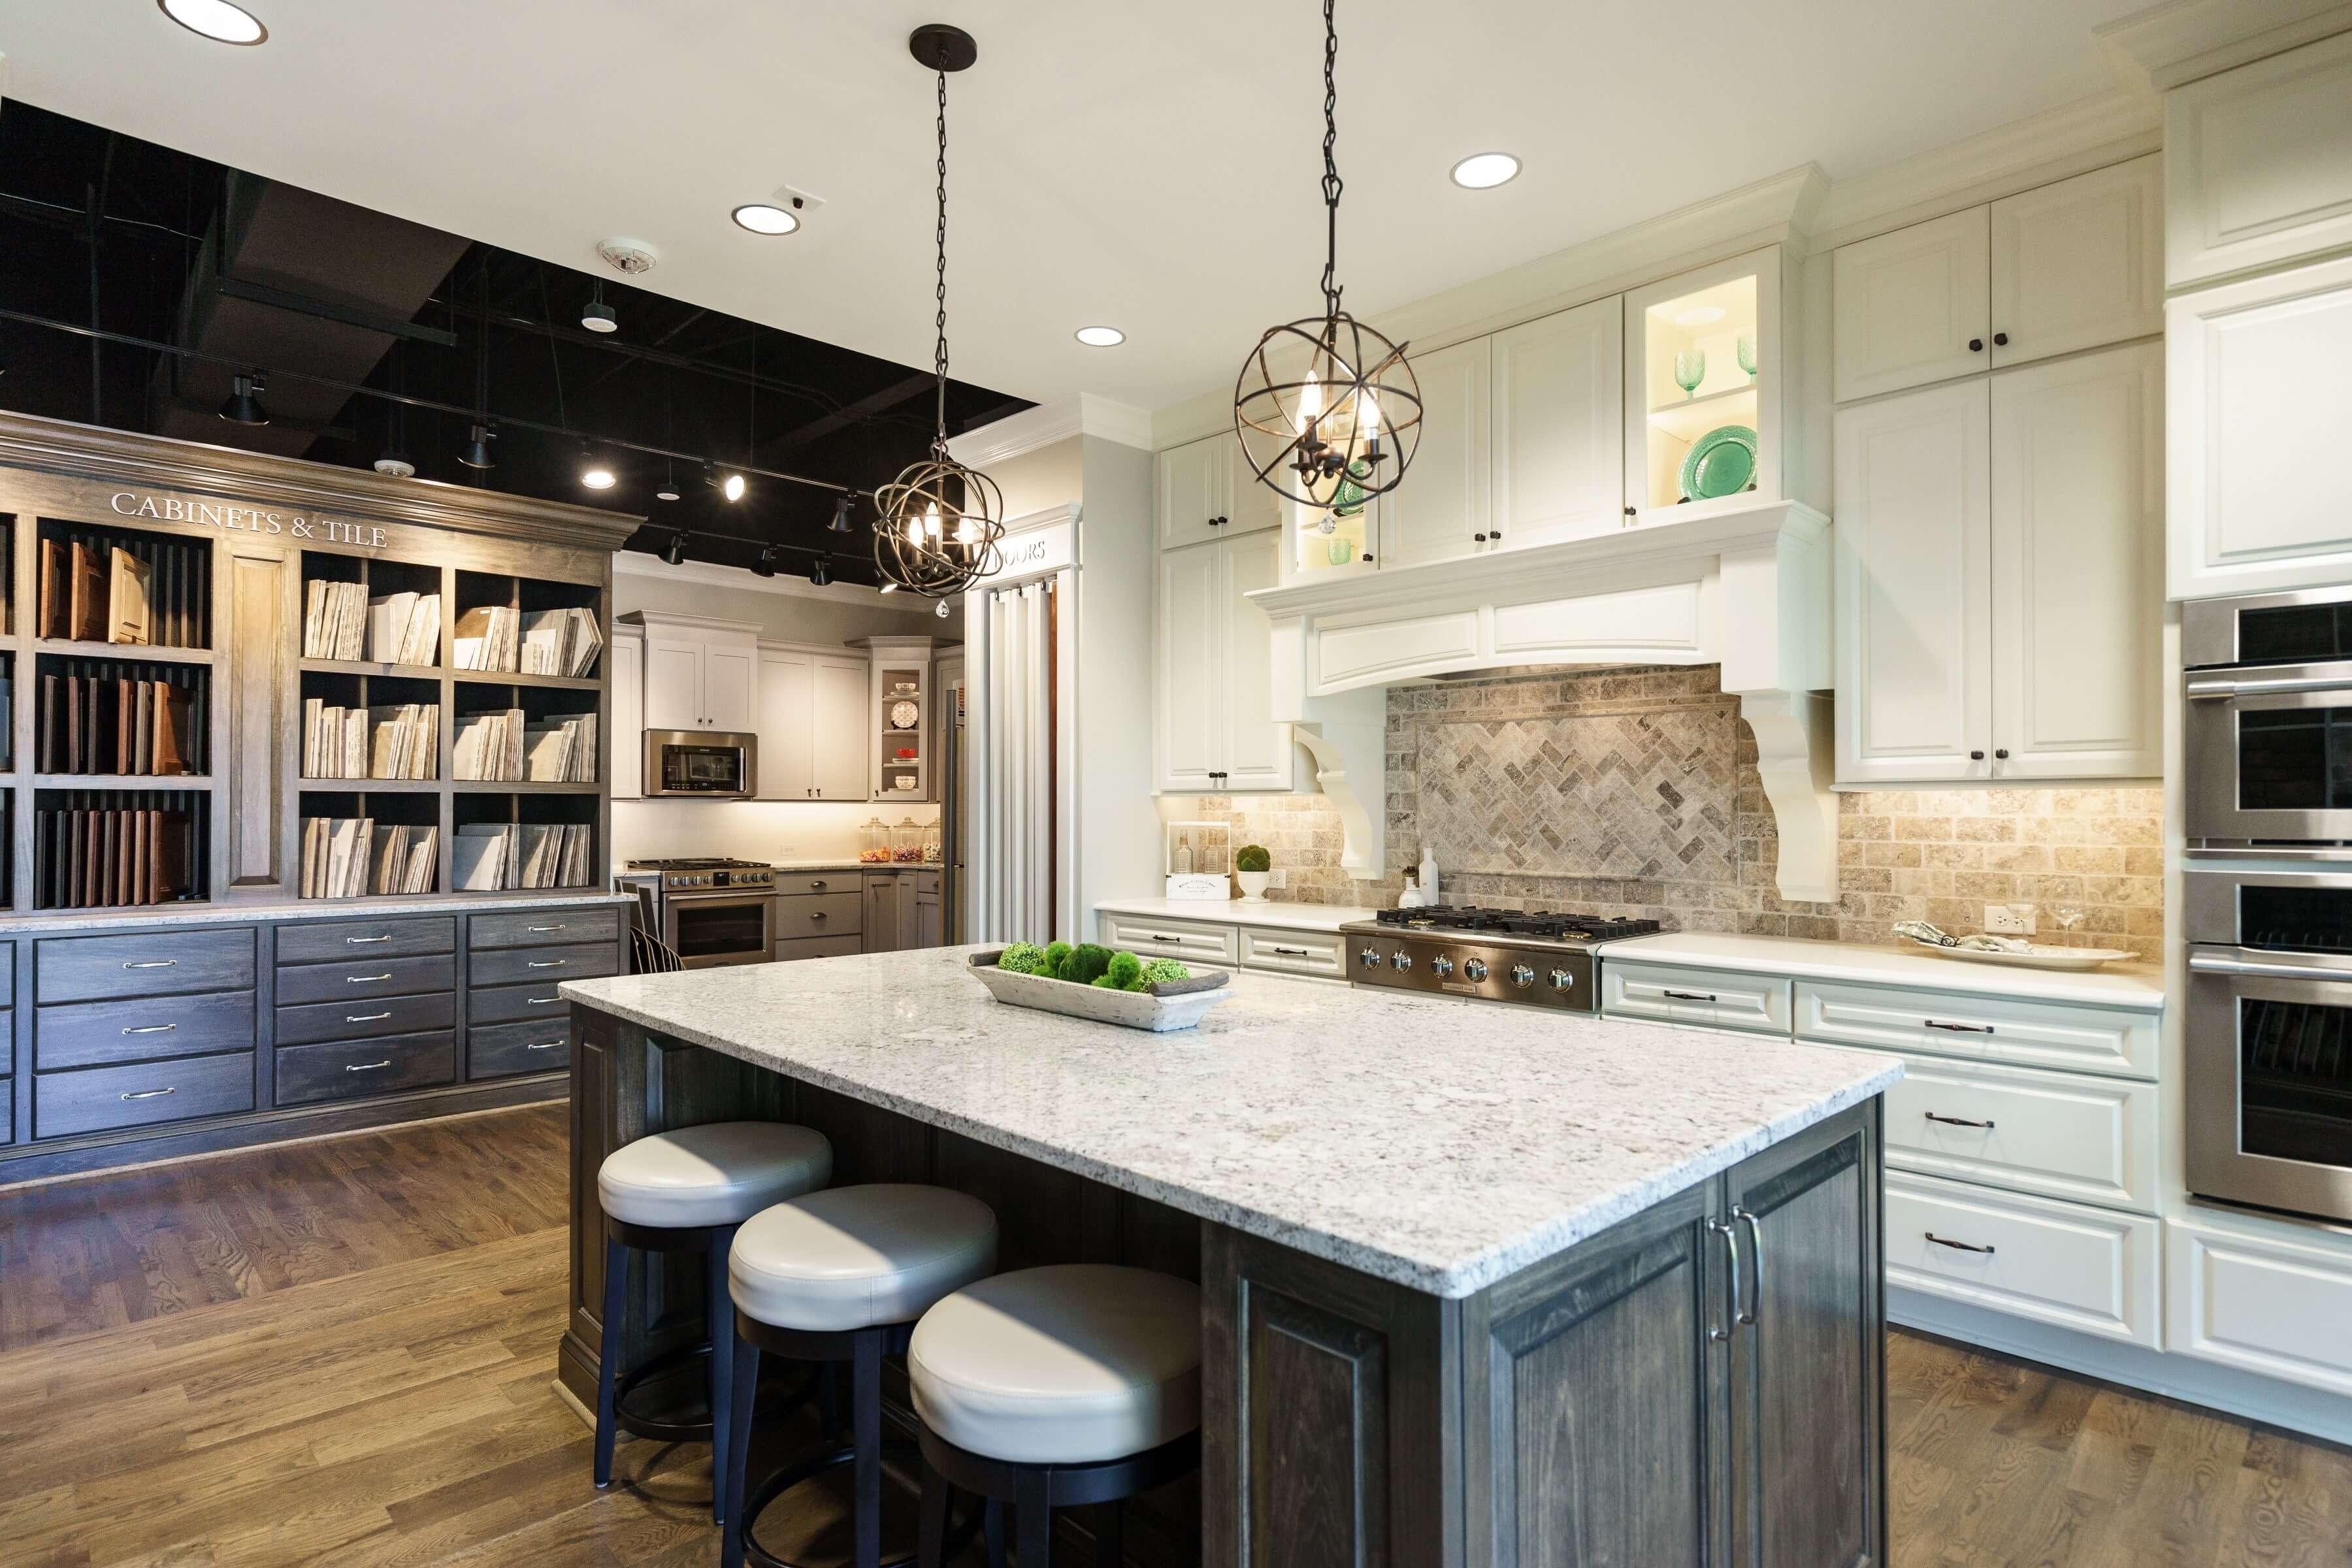 raleigh - Living Kitchen Raleigh